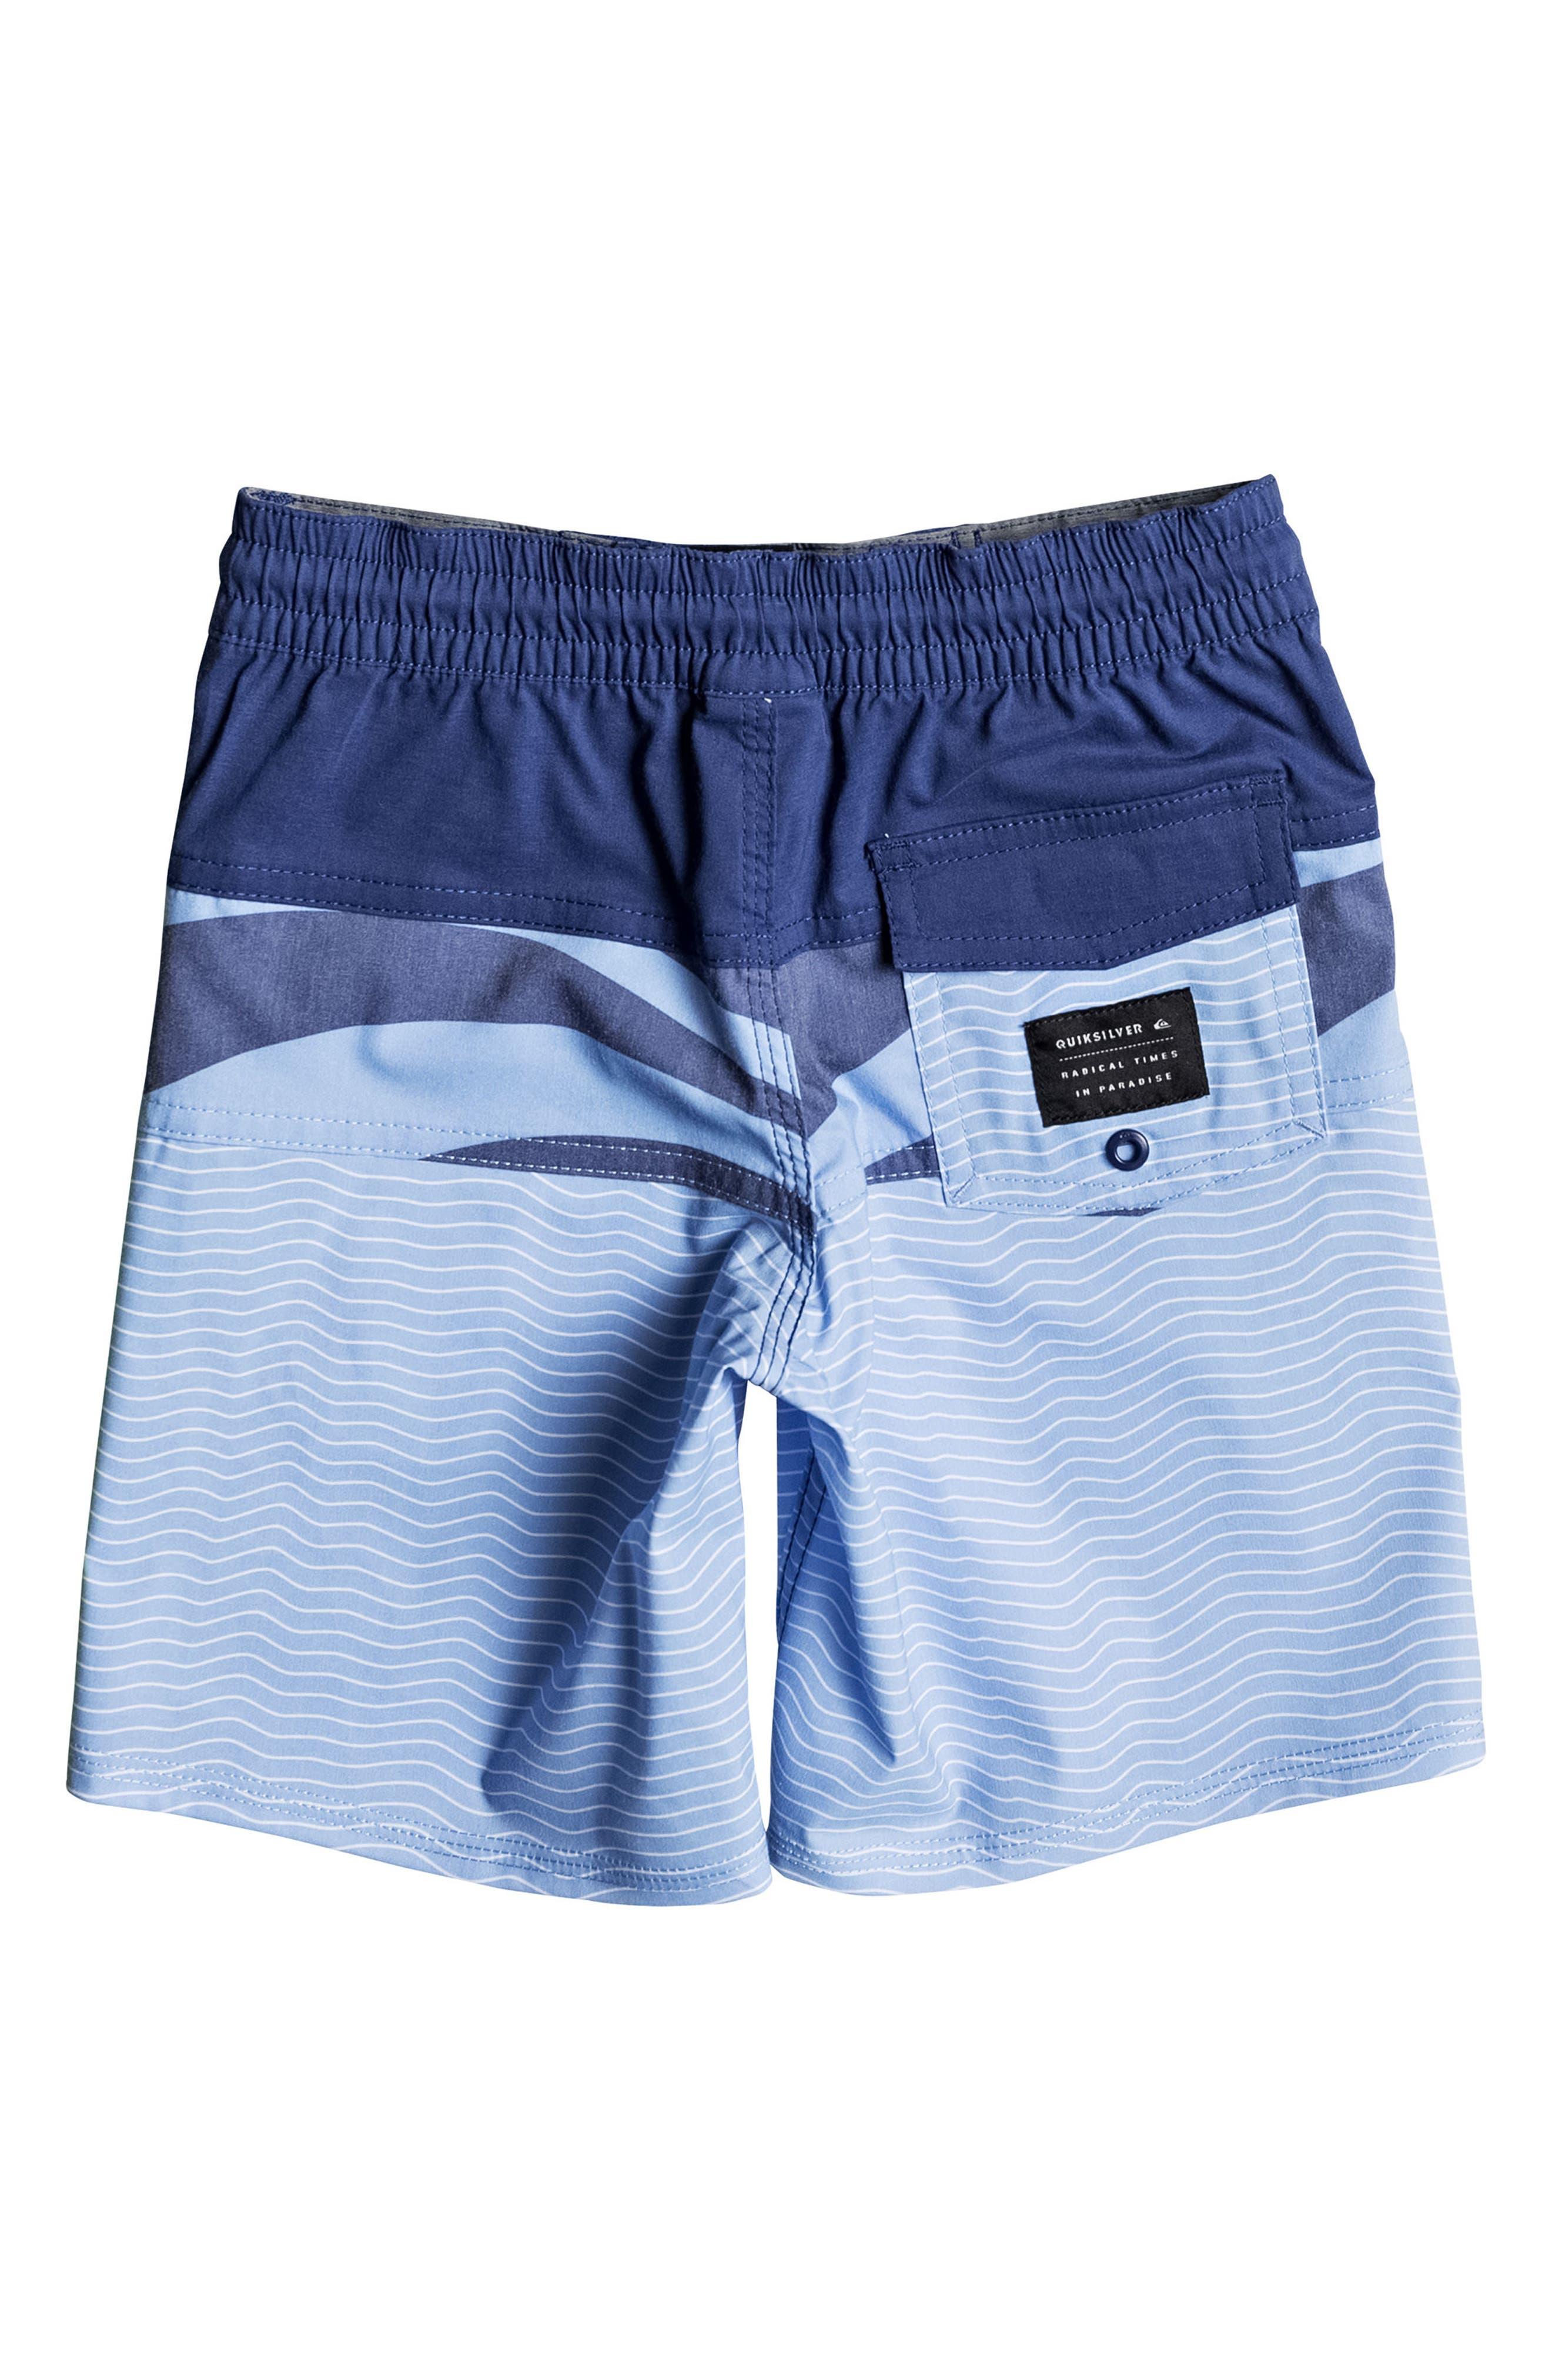 Heatwave Blocked Board Shorts,                             Alternate thumbnail 2, color,                             Estate Blue